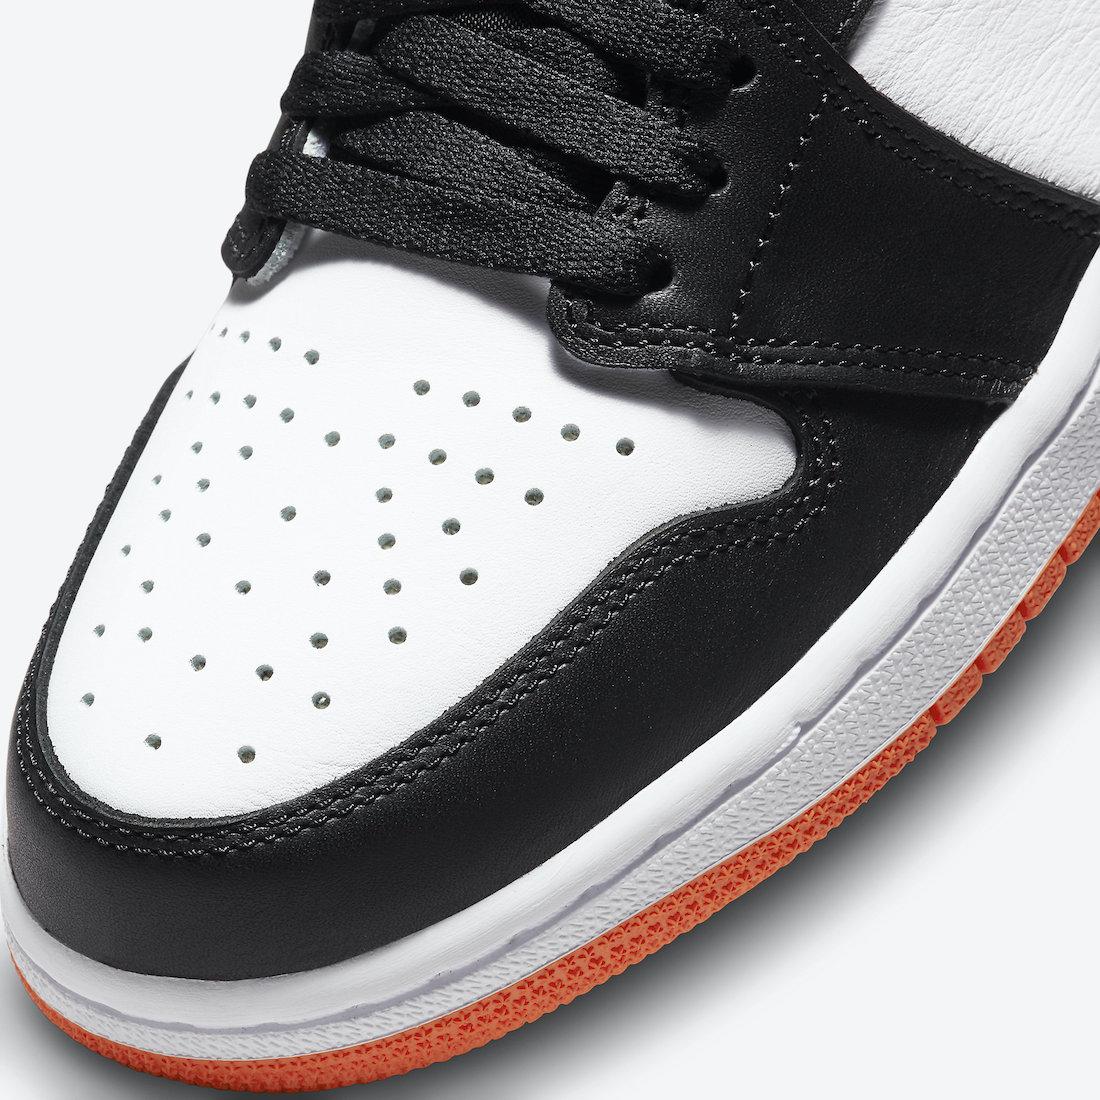 Air-Jordan-1-High-OG-Electro-Orange-555088-180-Release-Date-6